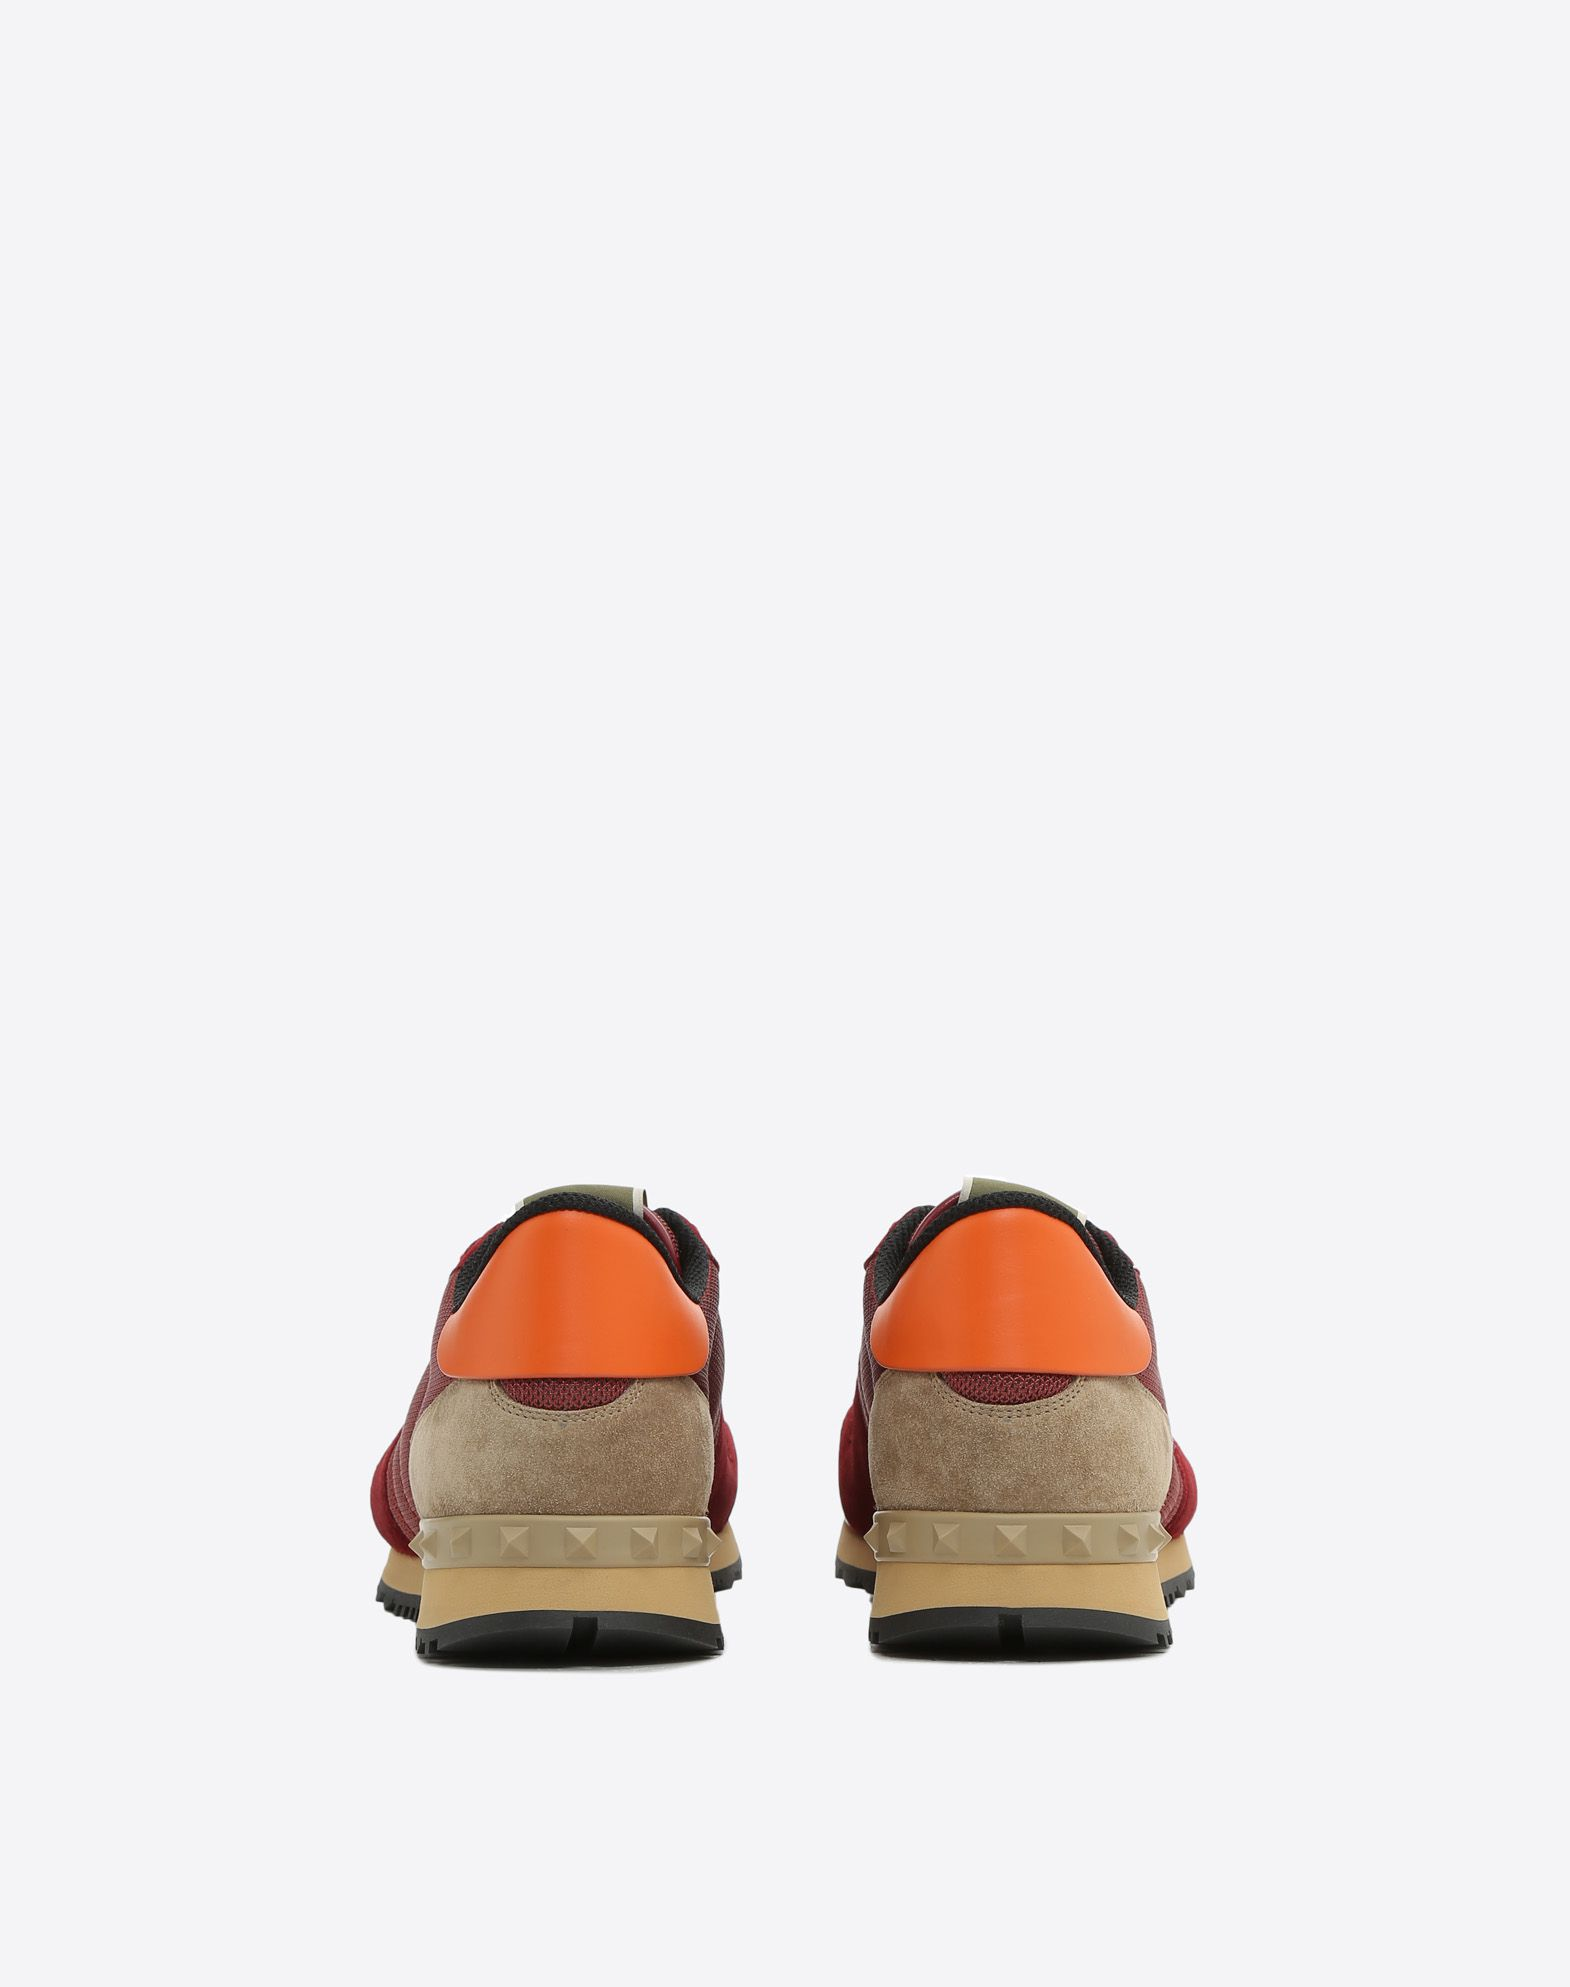 VALENTINO GARAVANI UOMO Rockrunner Sneaker LOW-TOP SNEAKERS U d